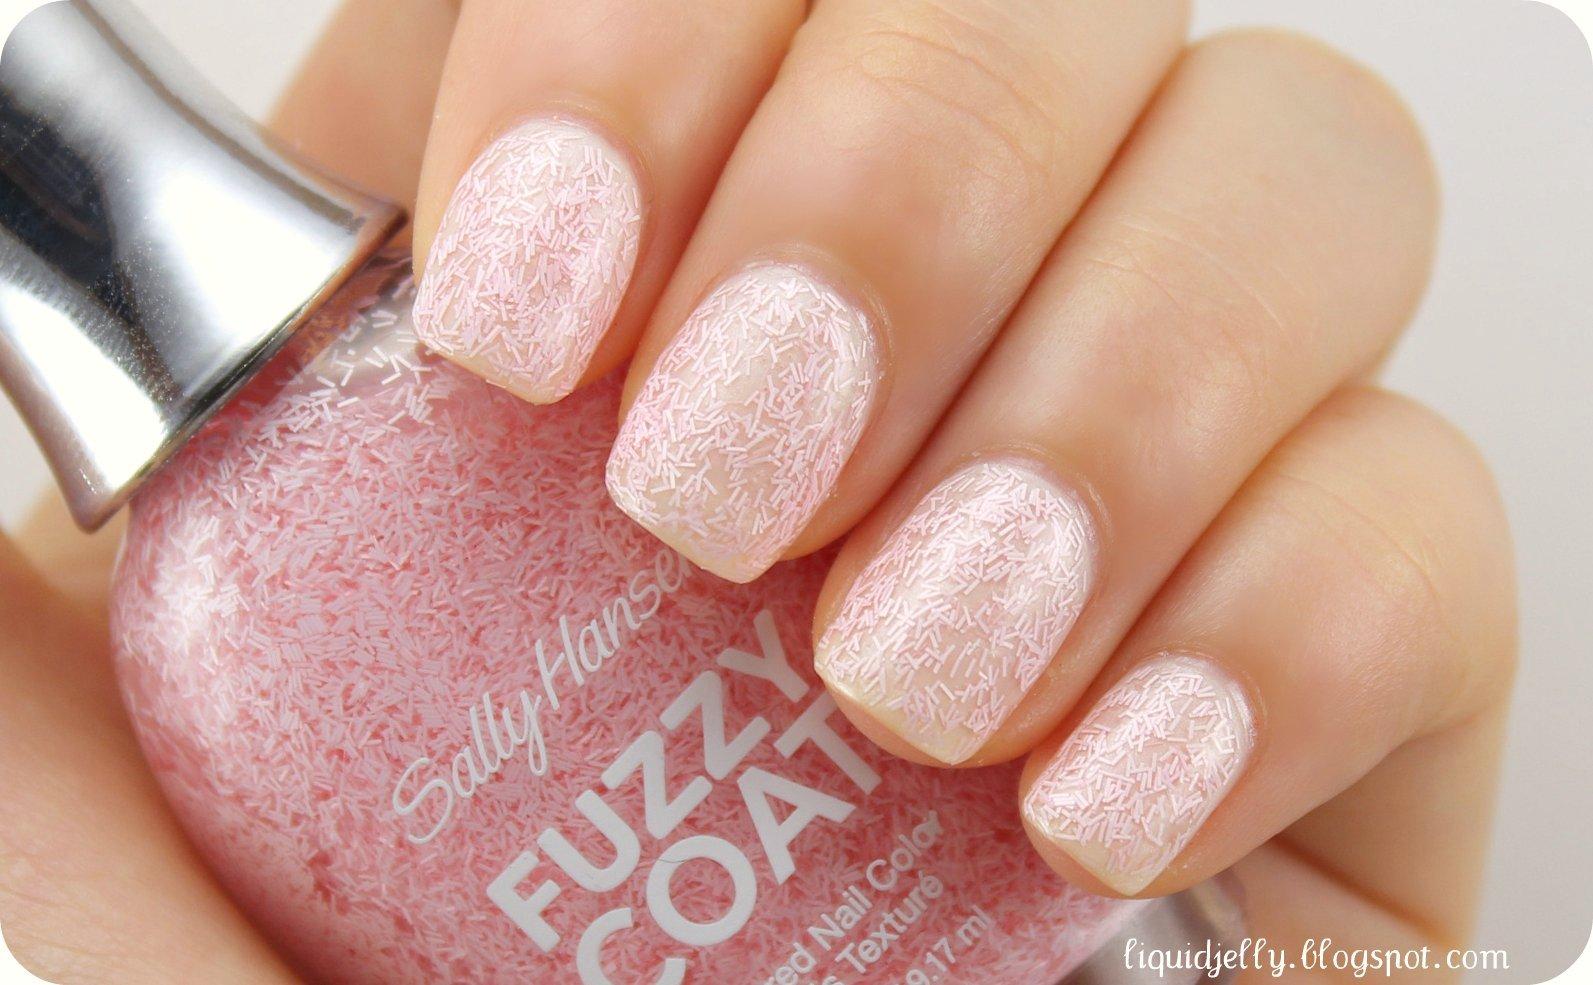 Liquid Jelly: Sally Hansen Fuzzy Coat Review